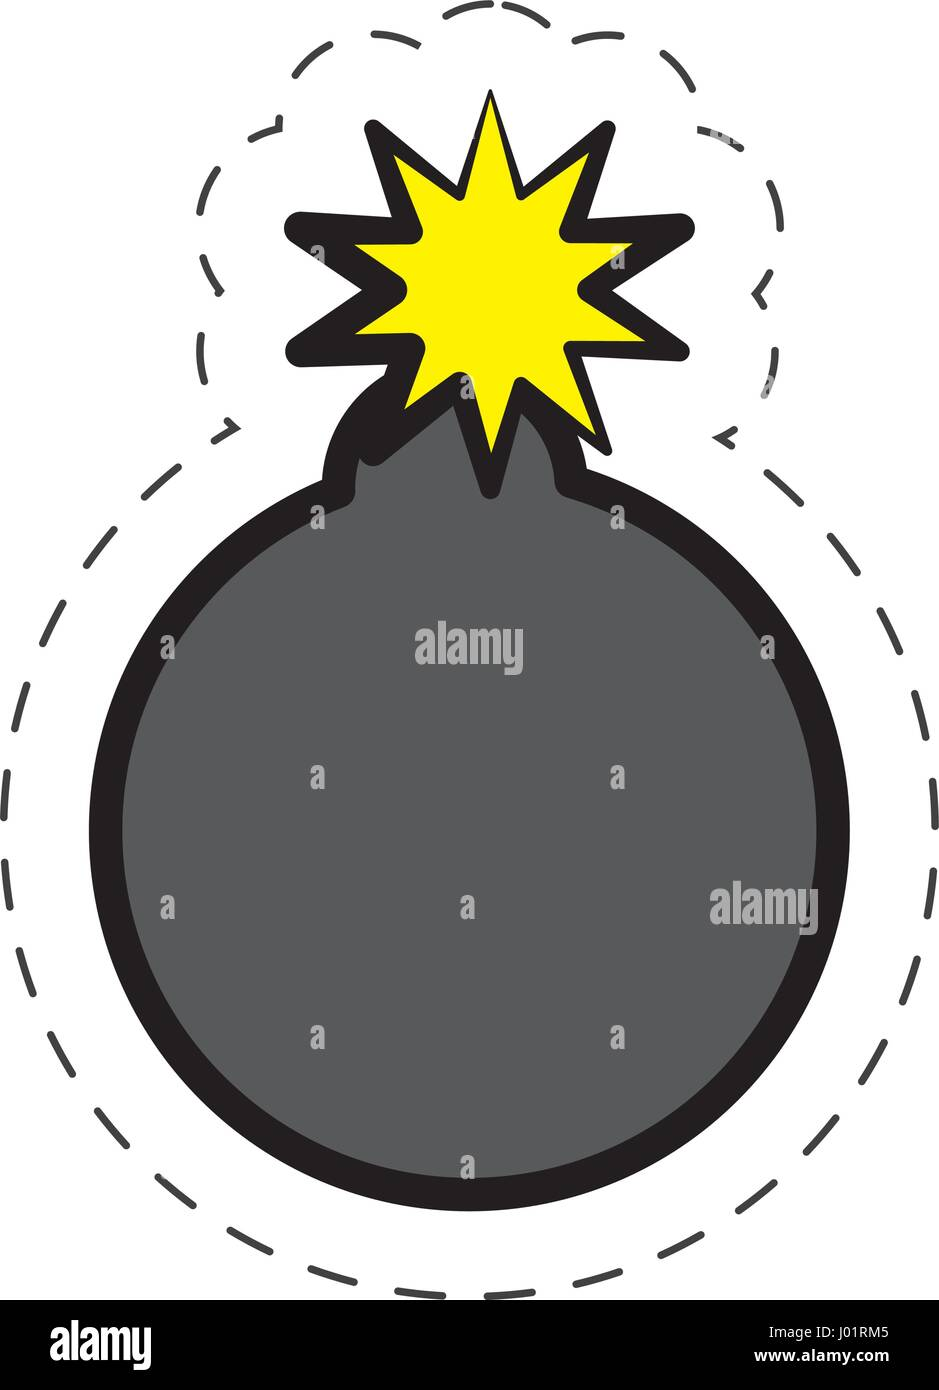 comic bomb explotion symbol Stock Vector